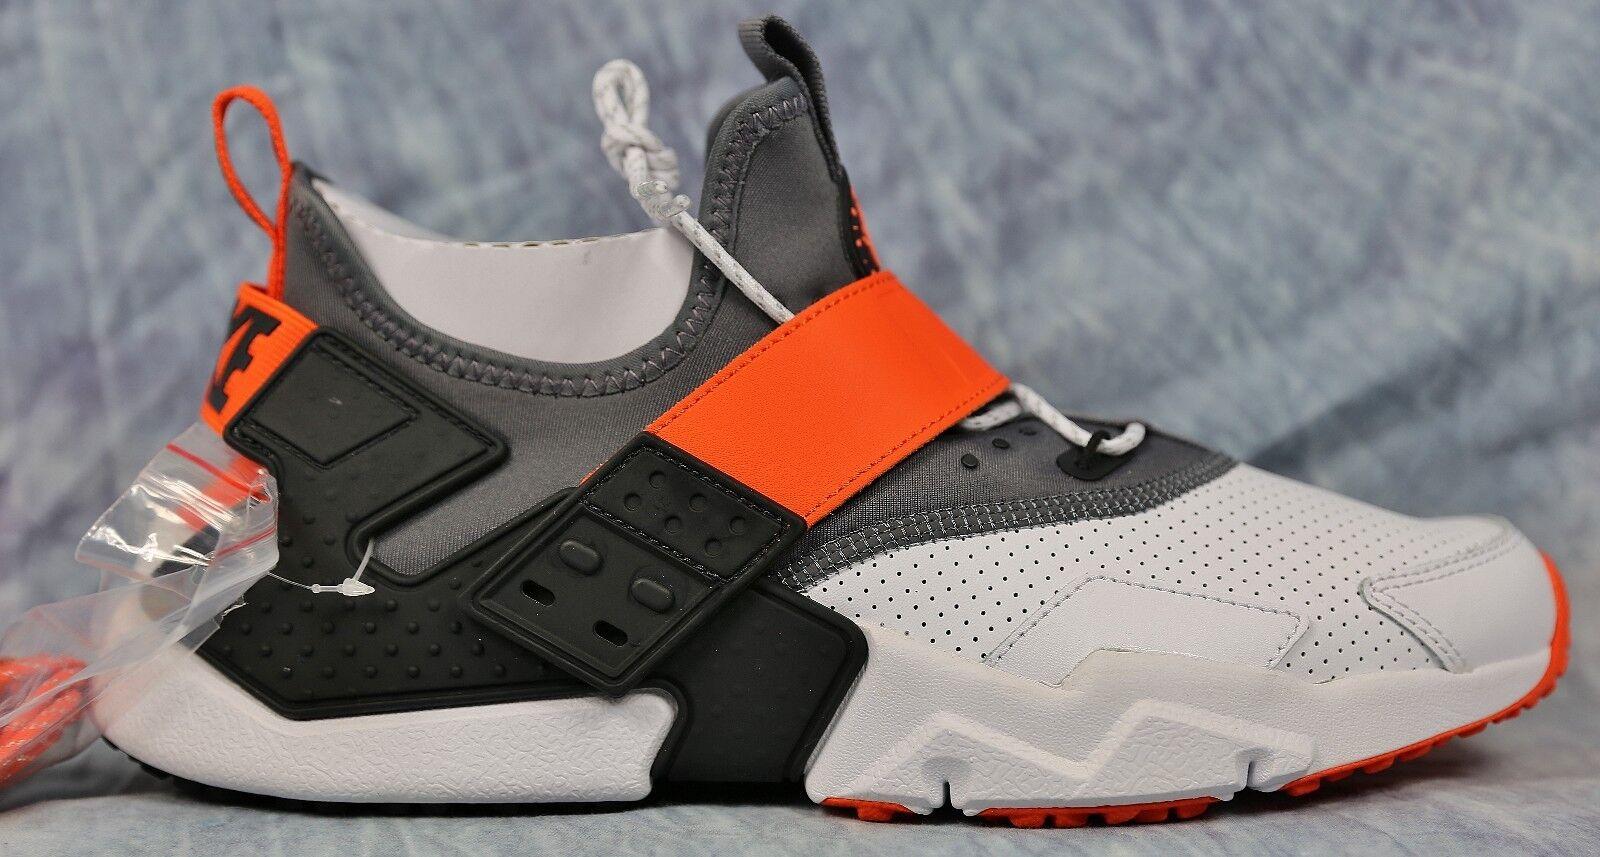 Nike Air Huarache Drift Premium Men's shoes Multiple Sizes AH7335-102